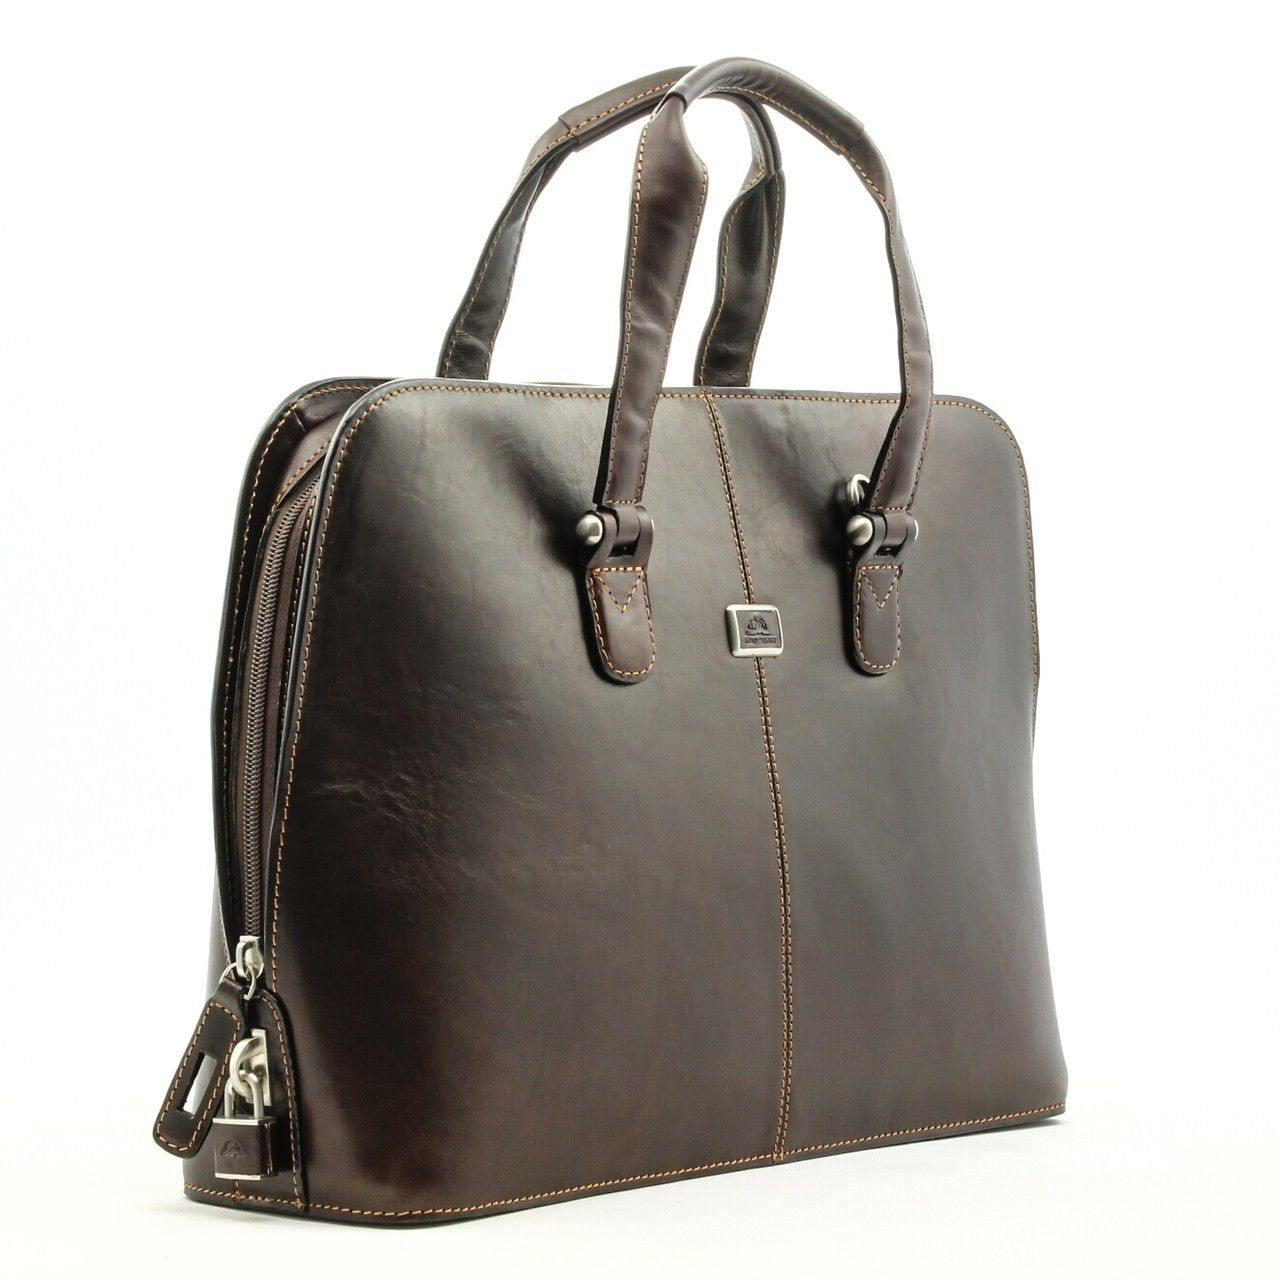 Elegant  Amp Accessories Gt Women39s Handbags Amp Bags Gt Briefcases A